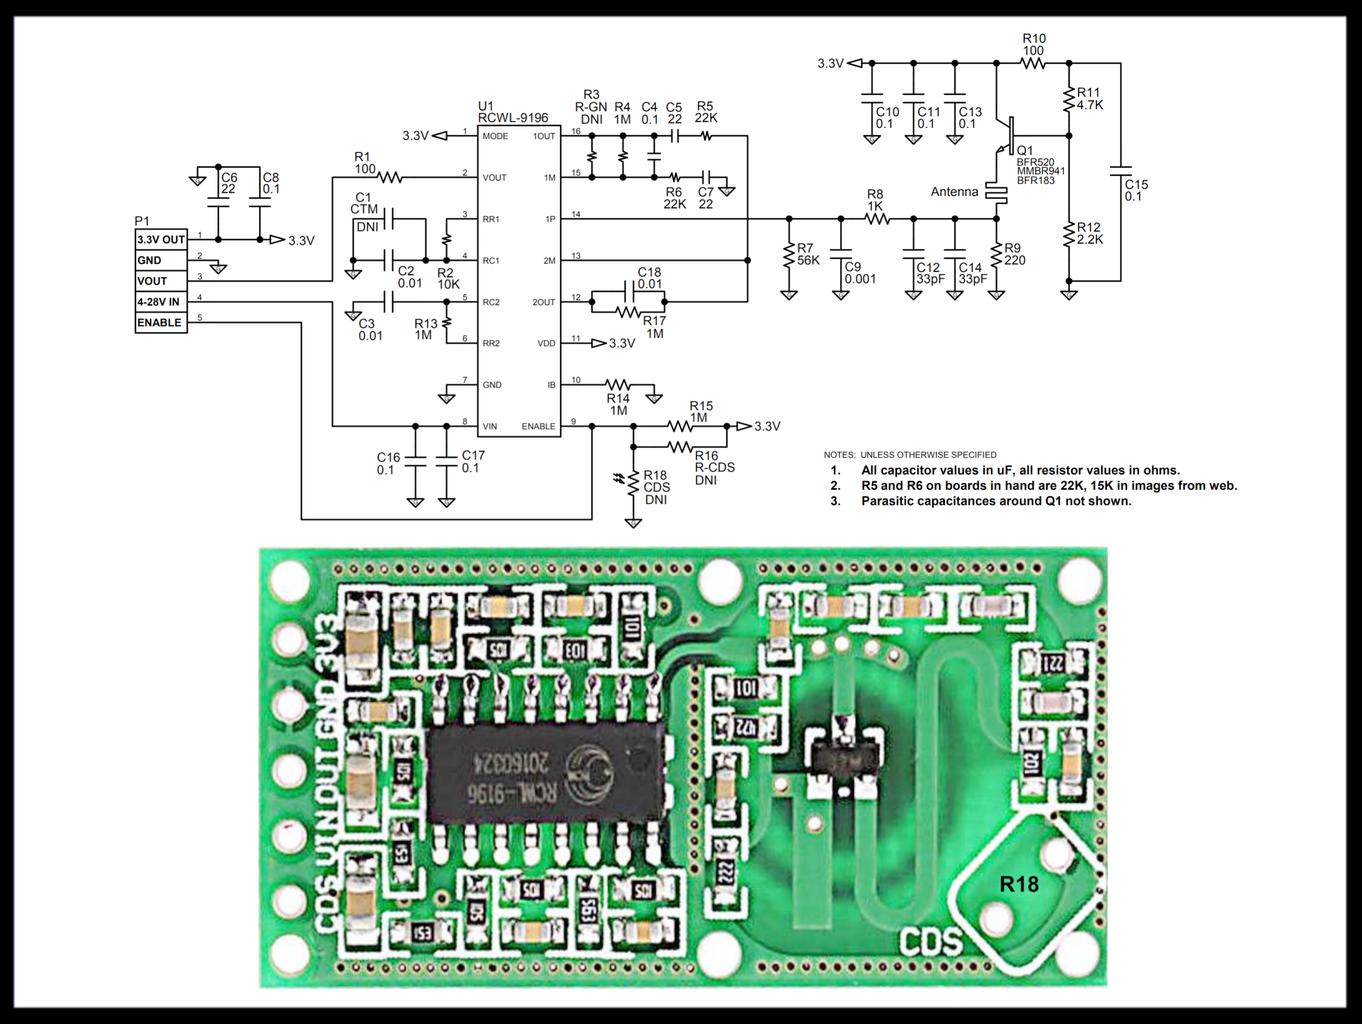 Proximity Sensing With RCWL-0516 Doppler Radar Module